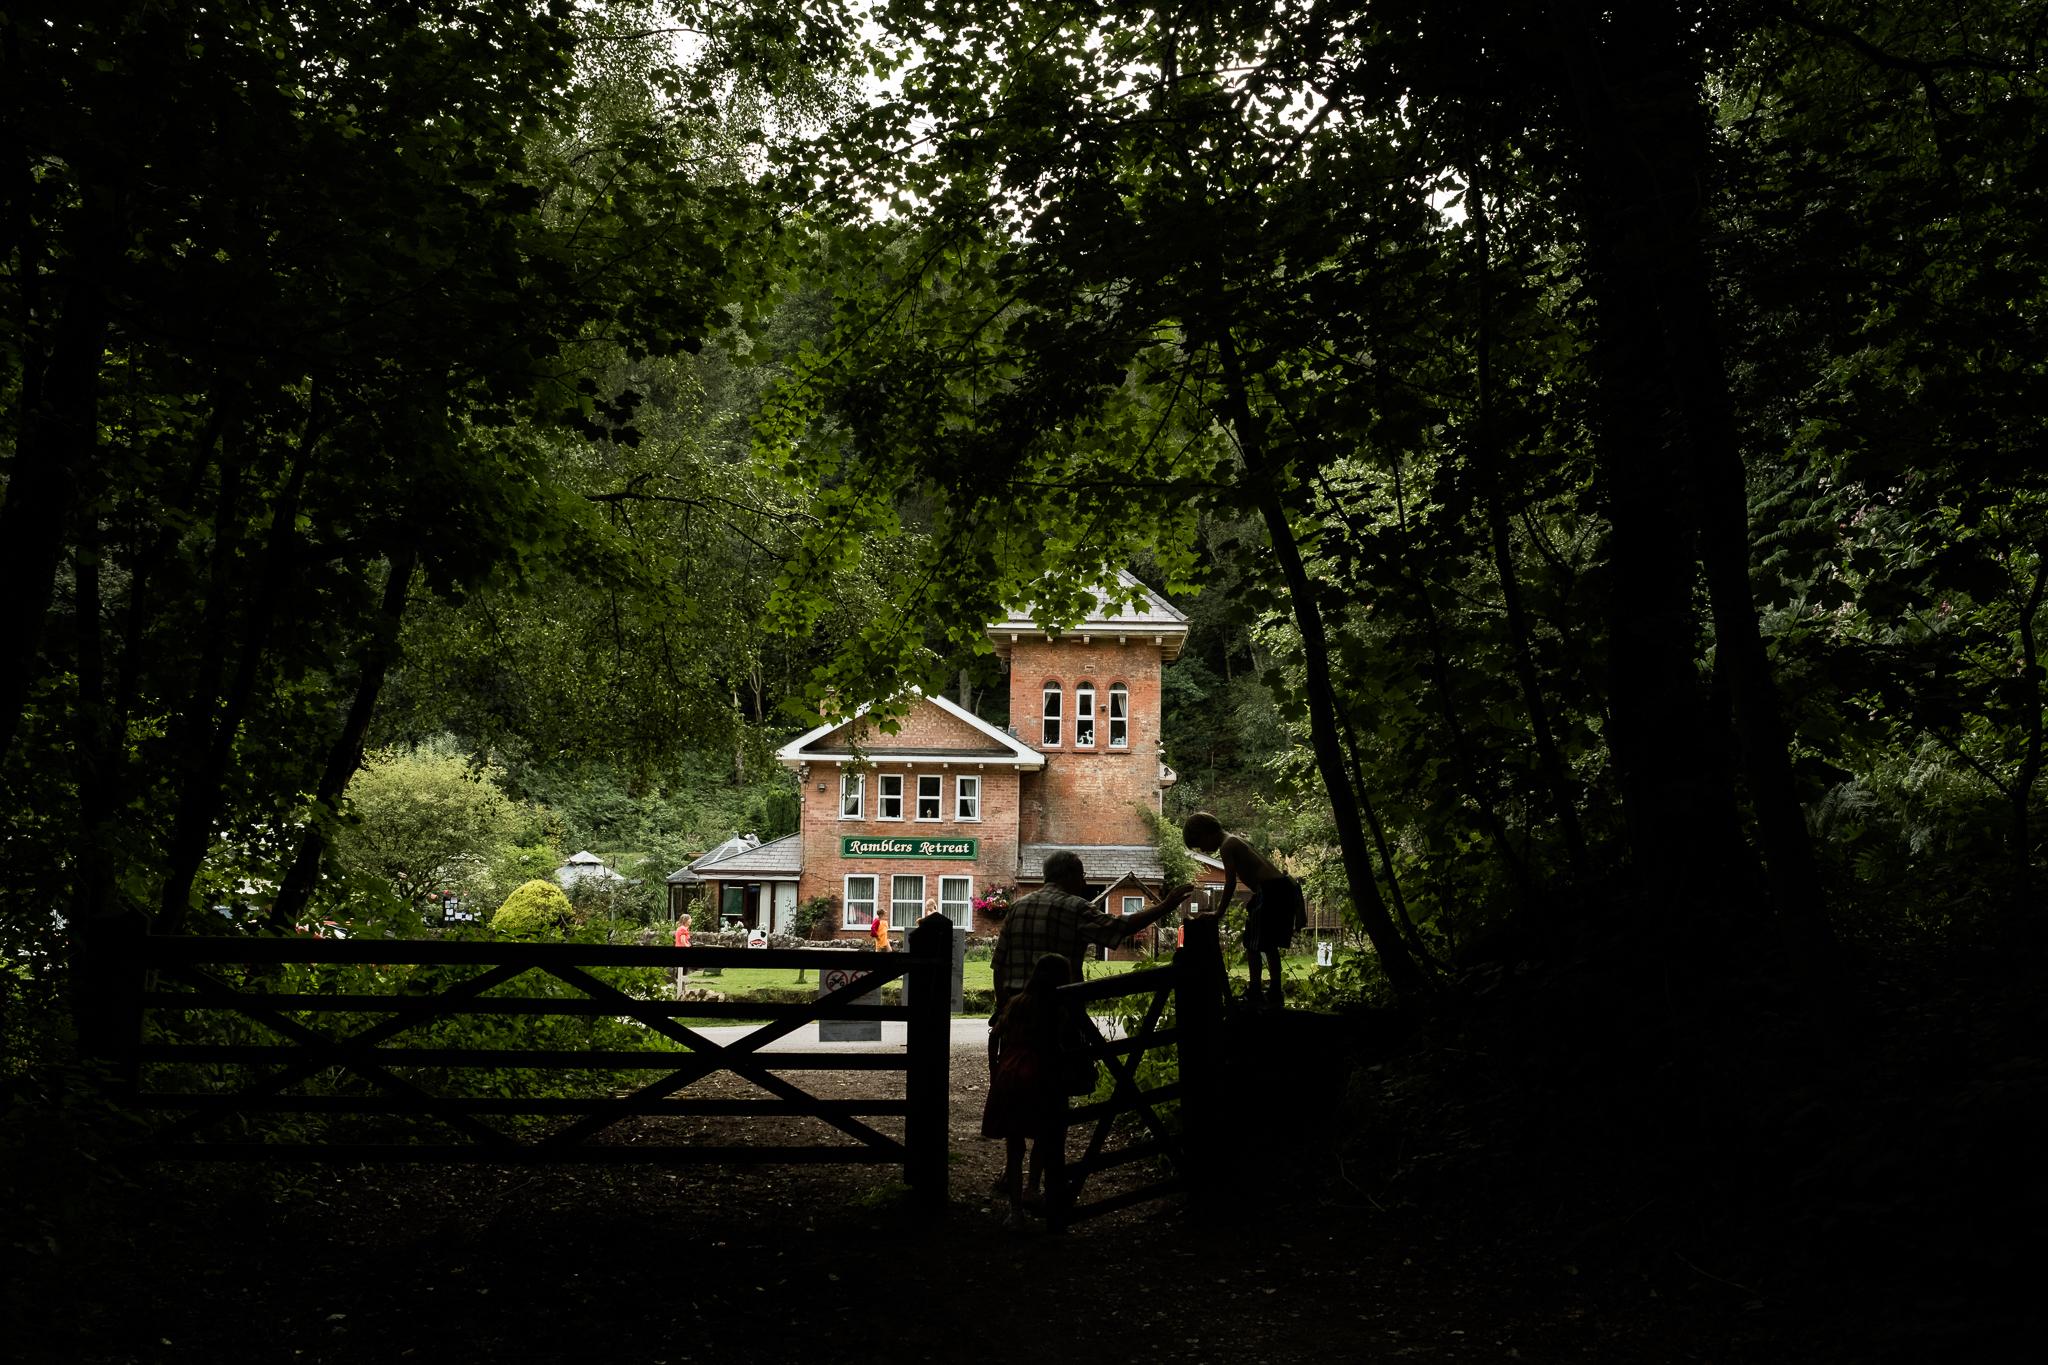 07.31.2016 Dimmingsdale Walk Photowalk Staffordshire Ramblers Retreat Trees-59.jpg